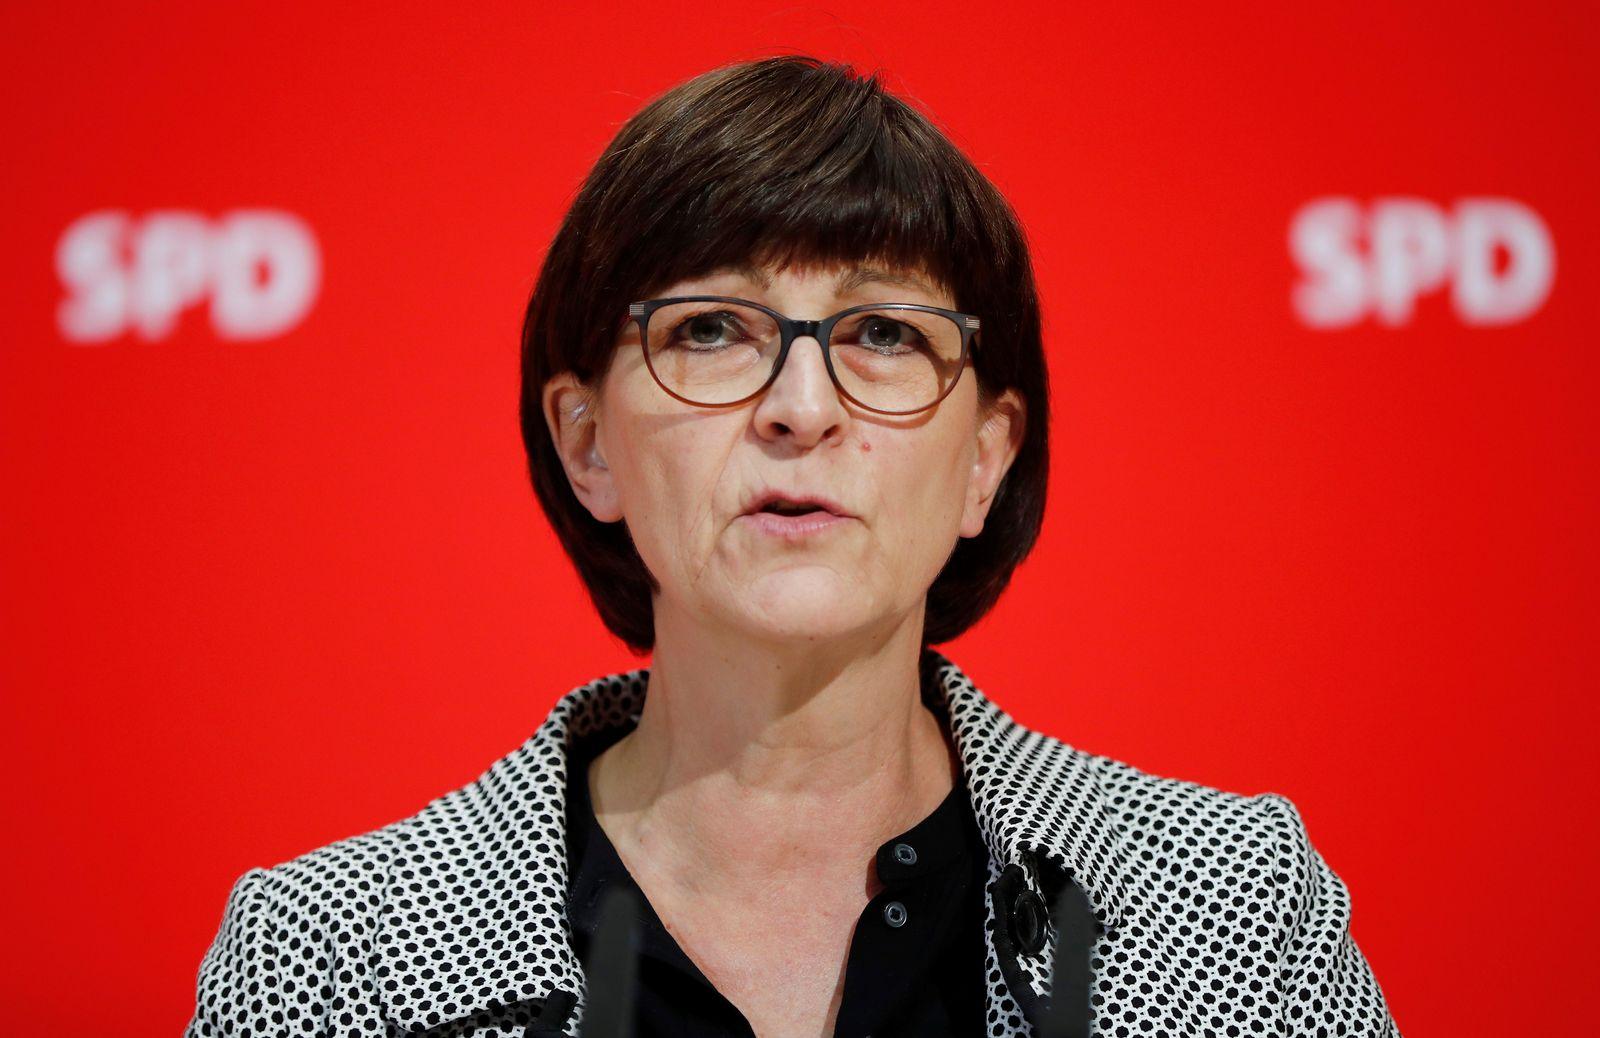 GERMANY-POLITICS/SPD